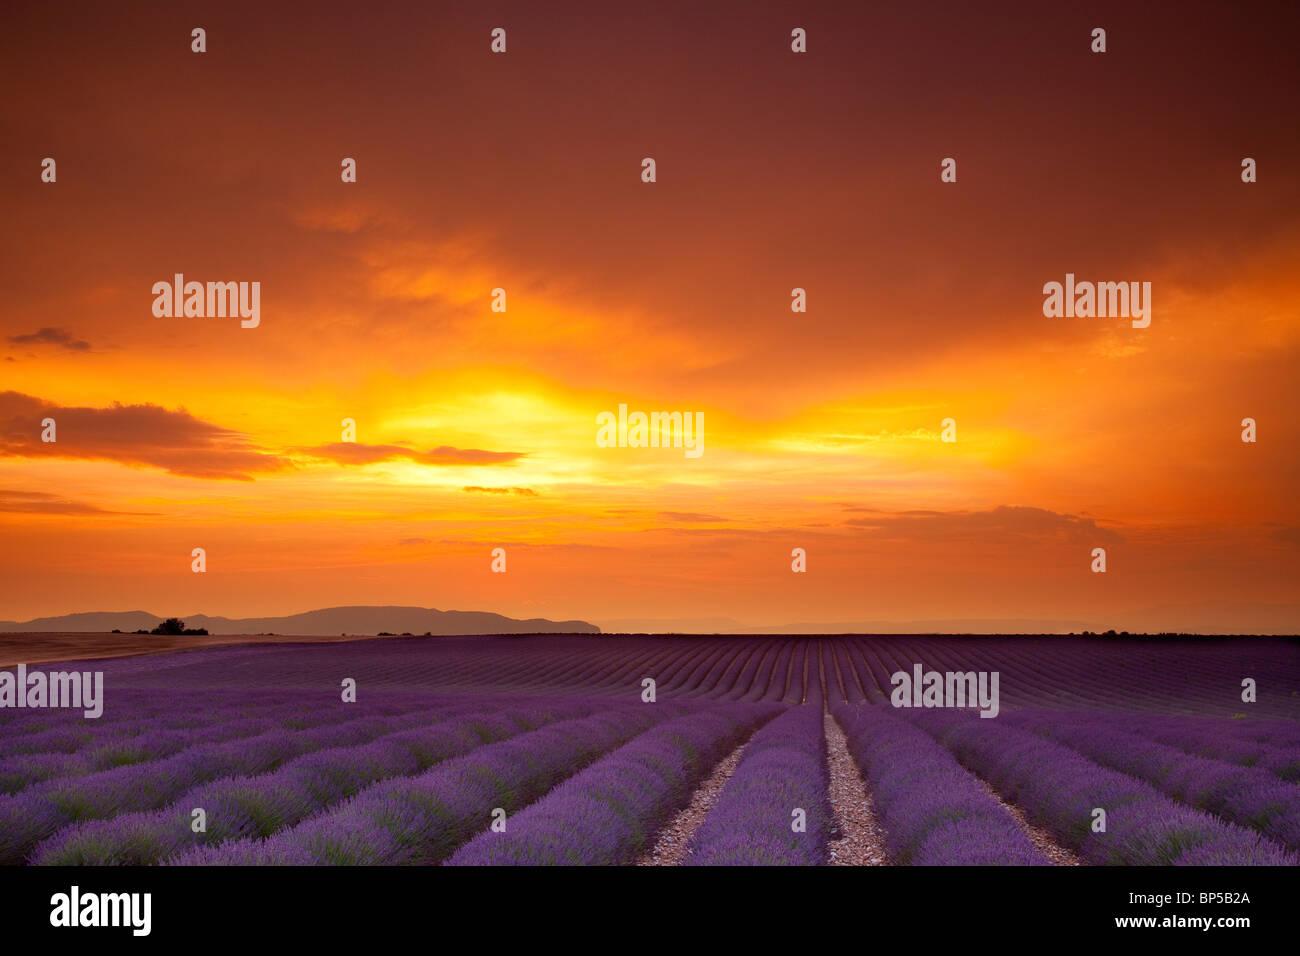 Farben des Sonnenuntergangs entlang der Valensole Plateau, Provence Frankreich Stockbild